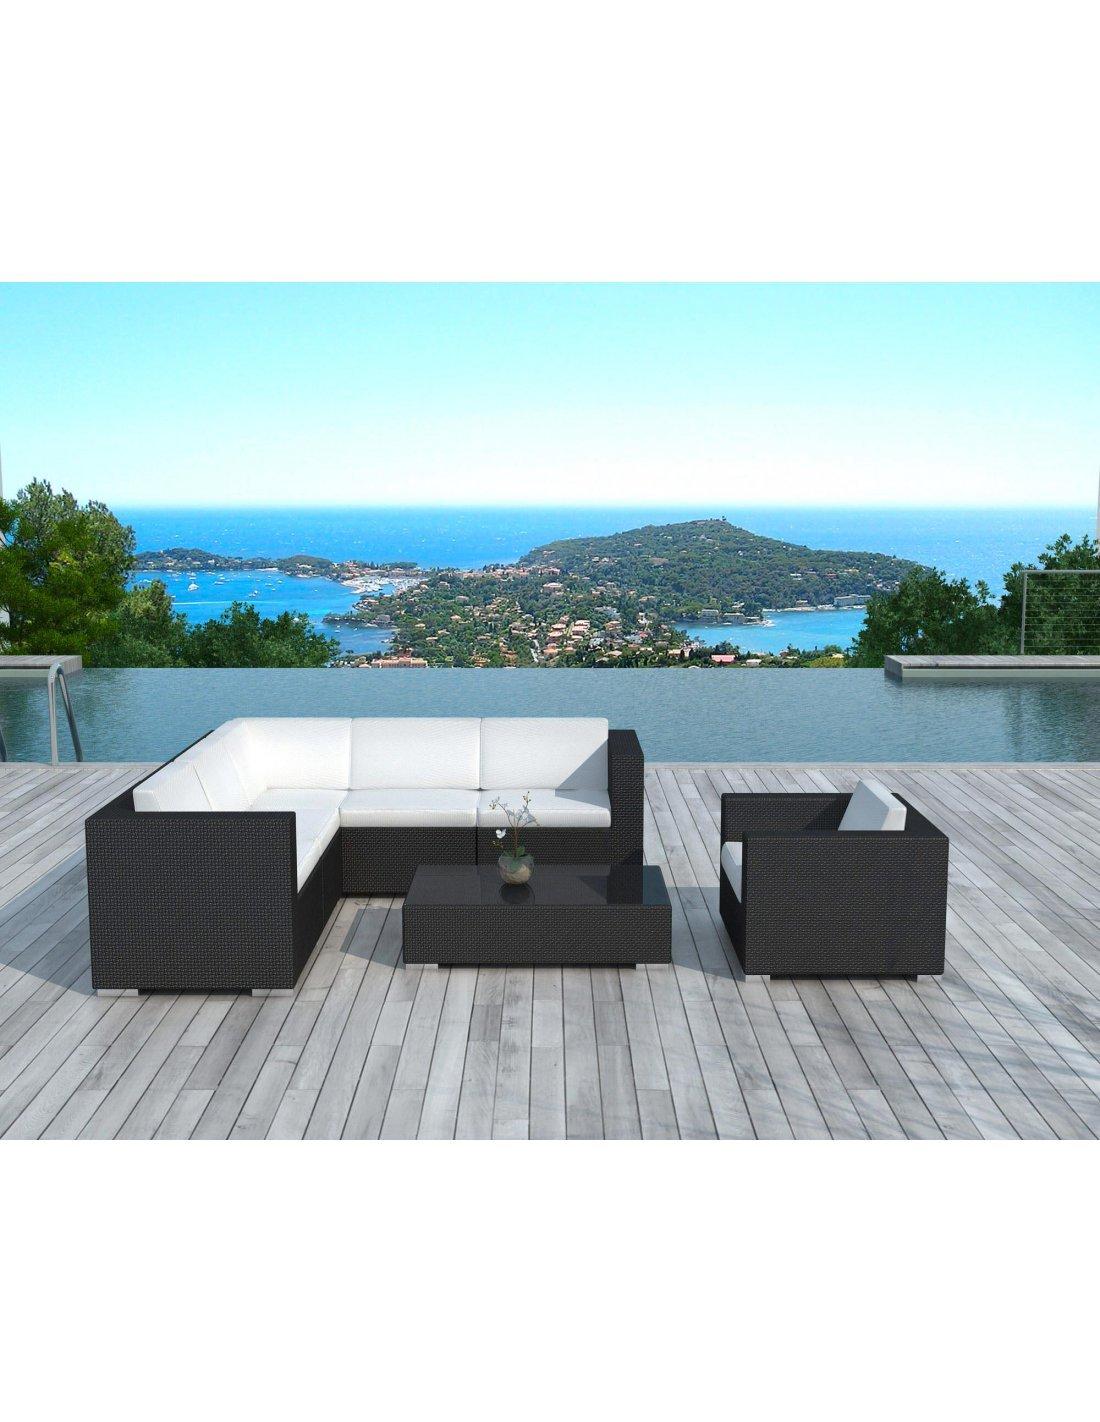 salon de jardin d 39 angle delorm black r sine tress e. Black Bedroom Furniture Sets. Home Design Ideas